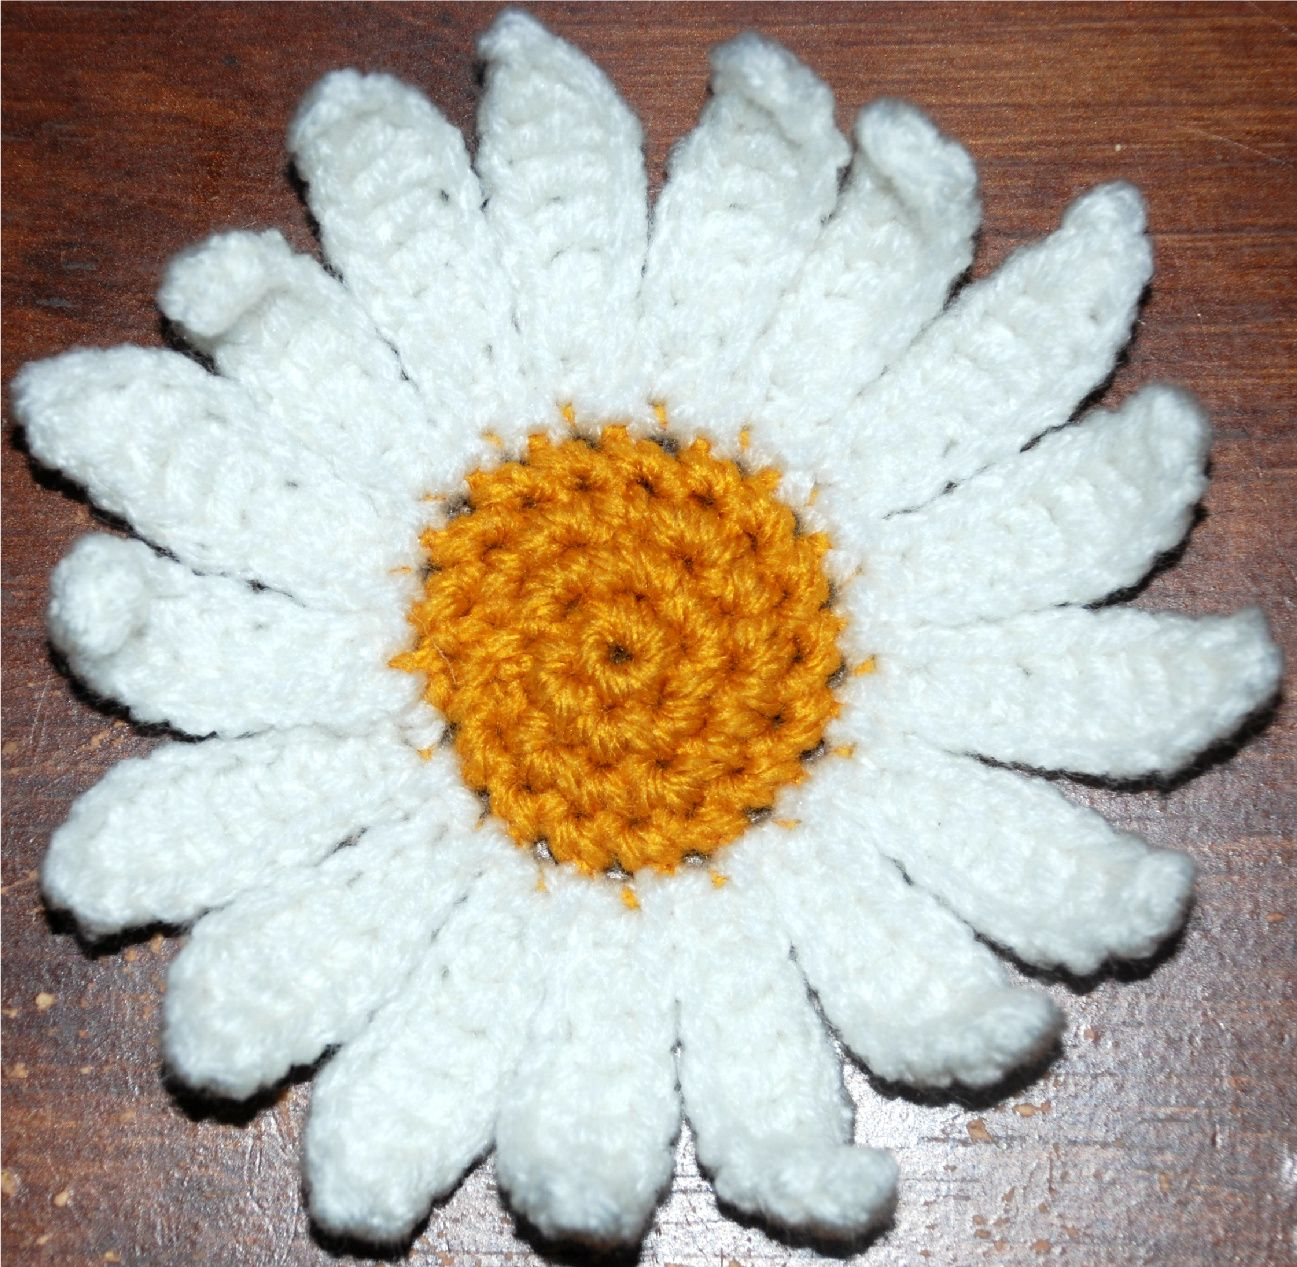 Crochet daisies crafthubs 1 crochet misc patterns free crochet pattern for a crochet daisy flower by crochet jewel izmirmasajfo Choice Image